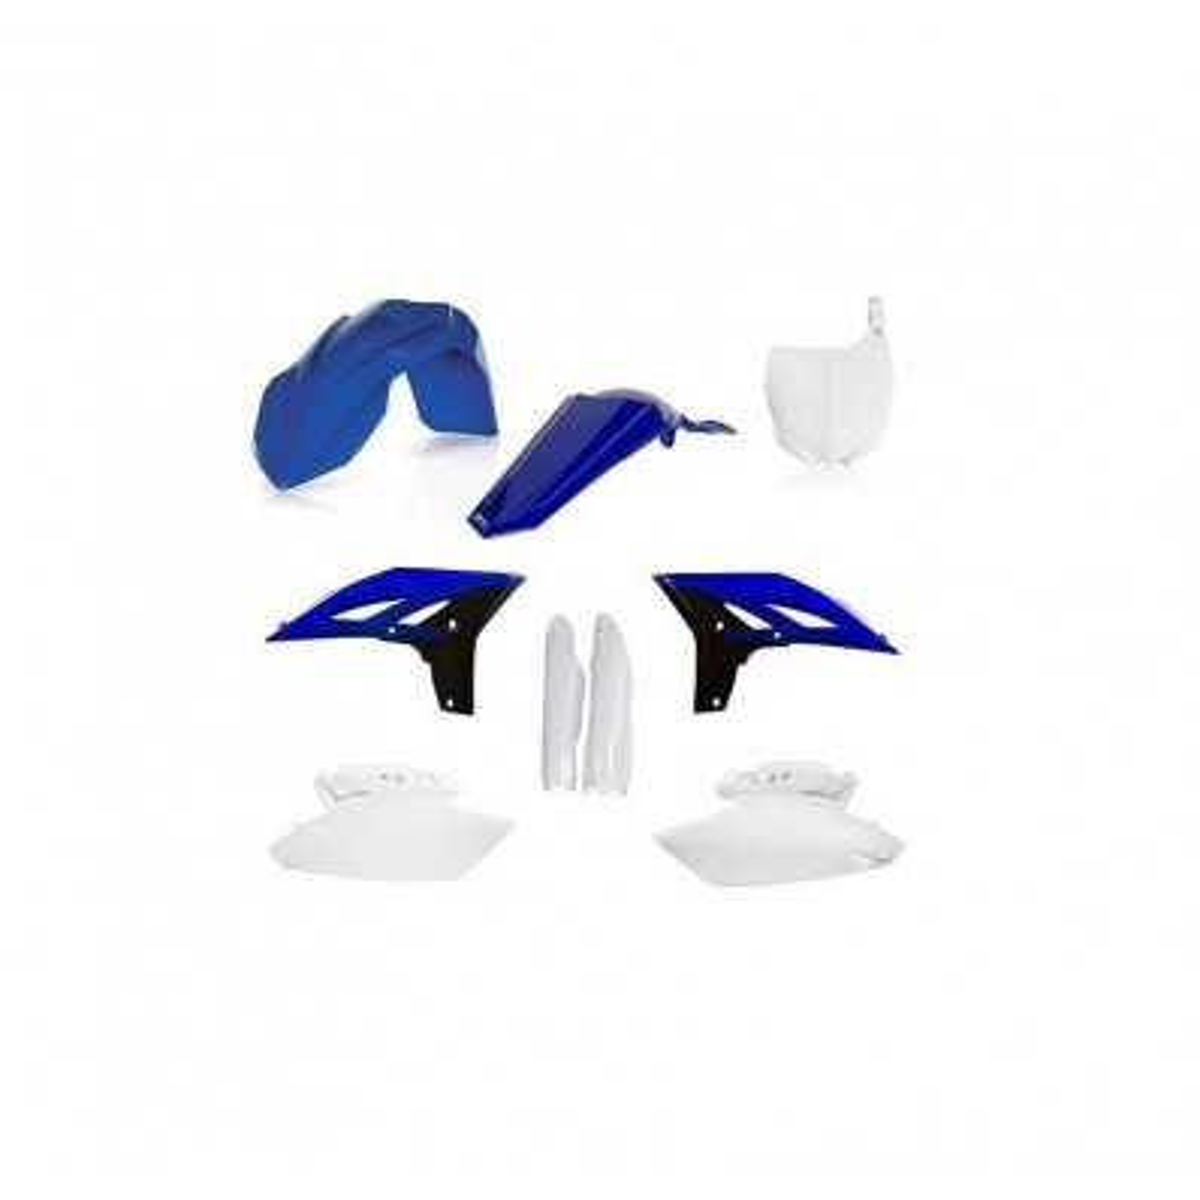 0023083-553 - Full Kit Plasticos Yz 125 18 Origen